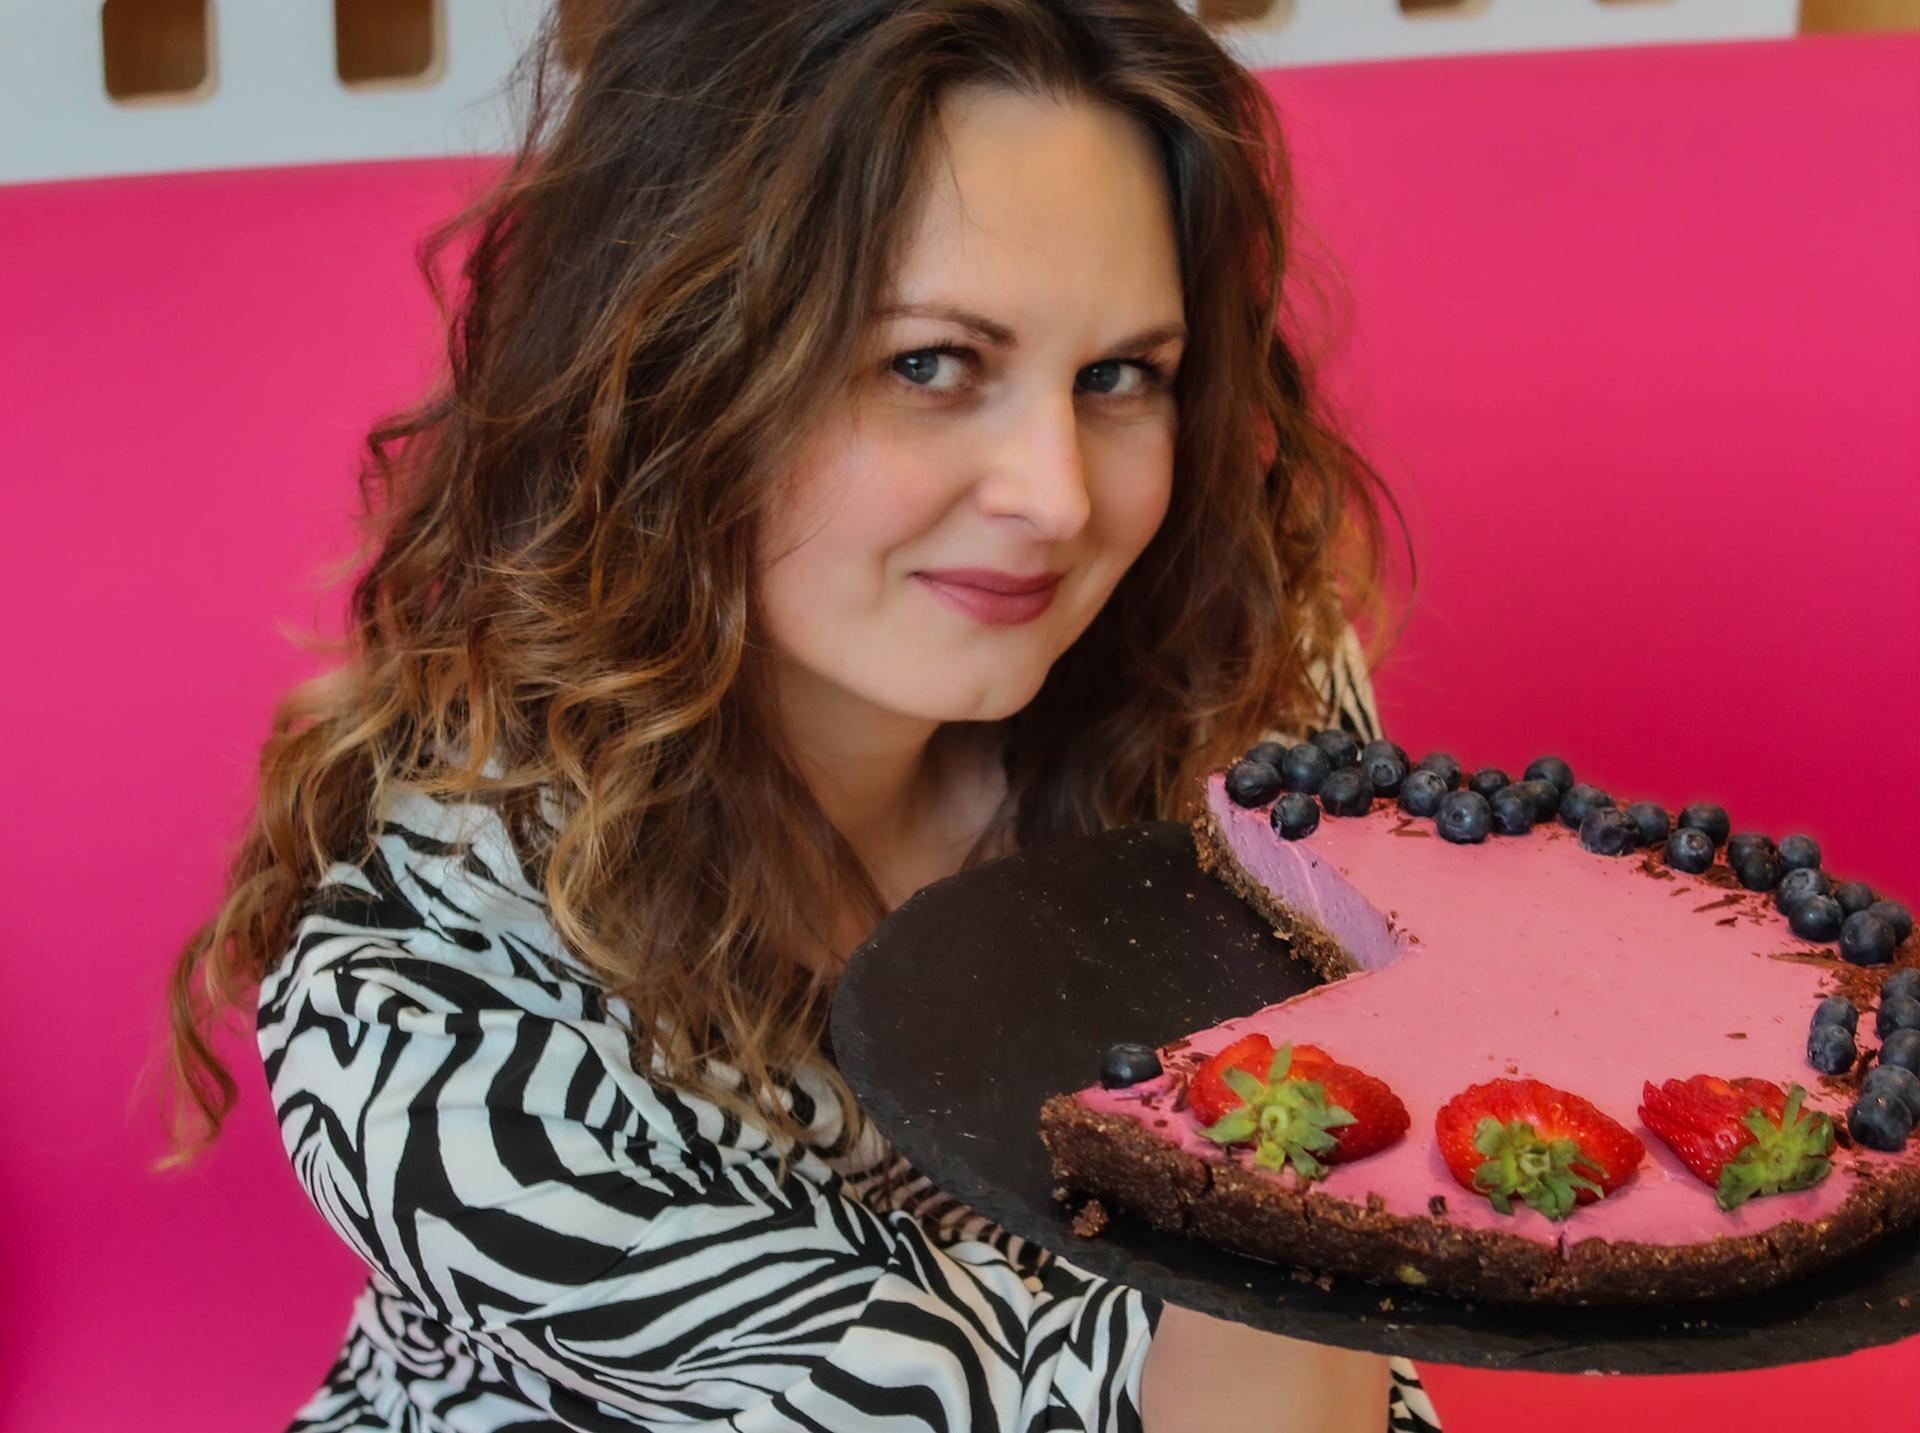 Read more about the article Pomysł Nie jestem z Cukru